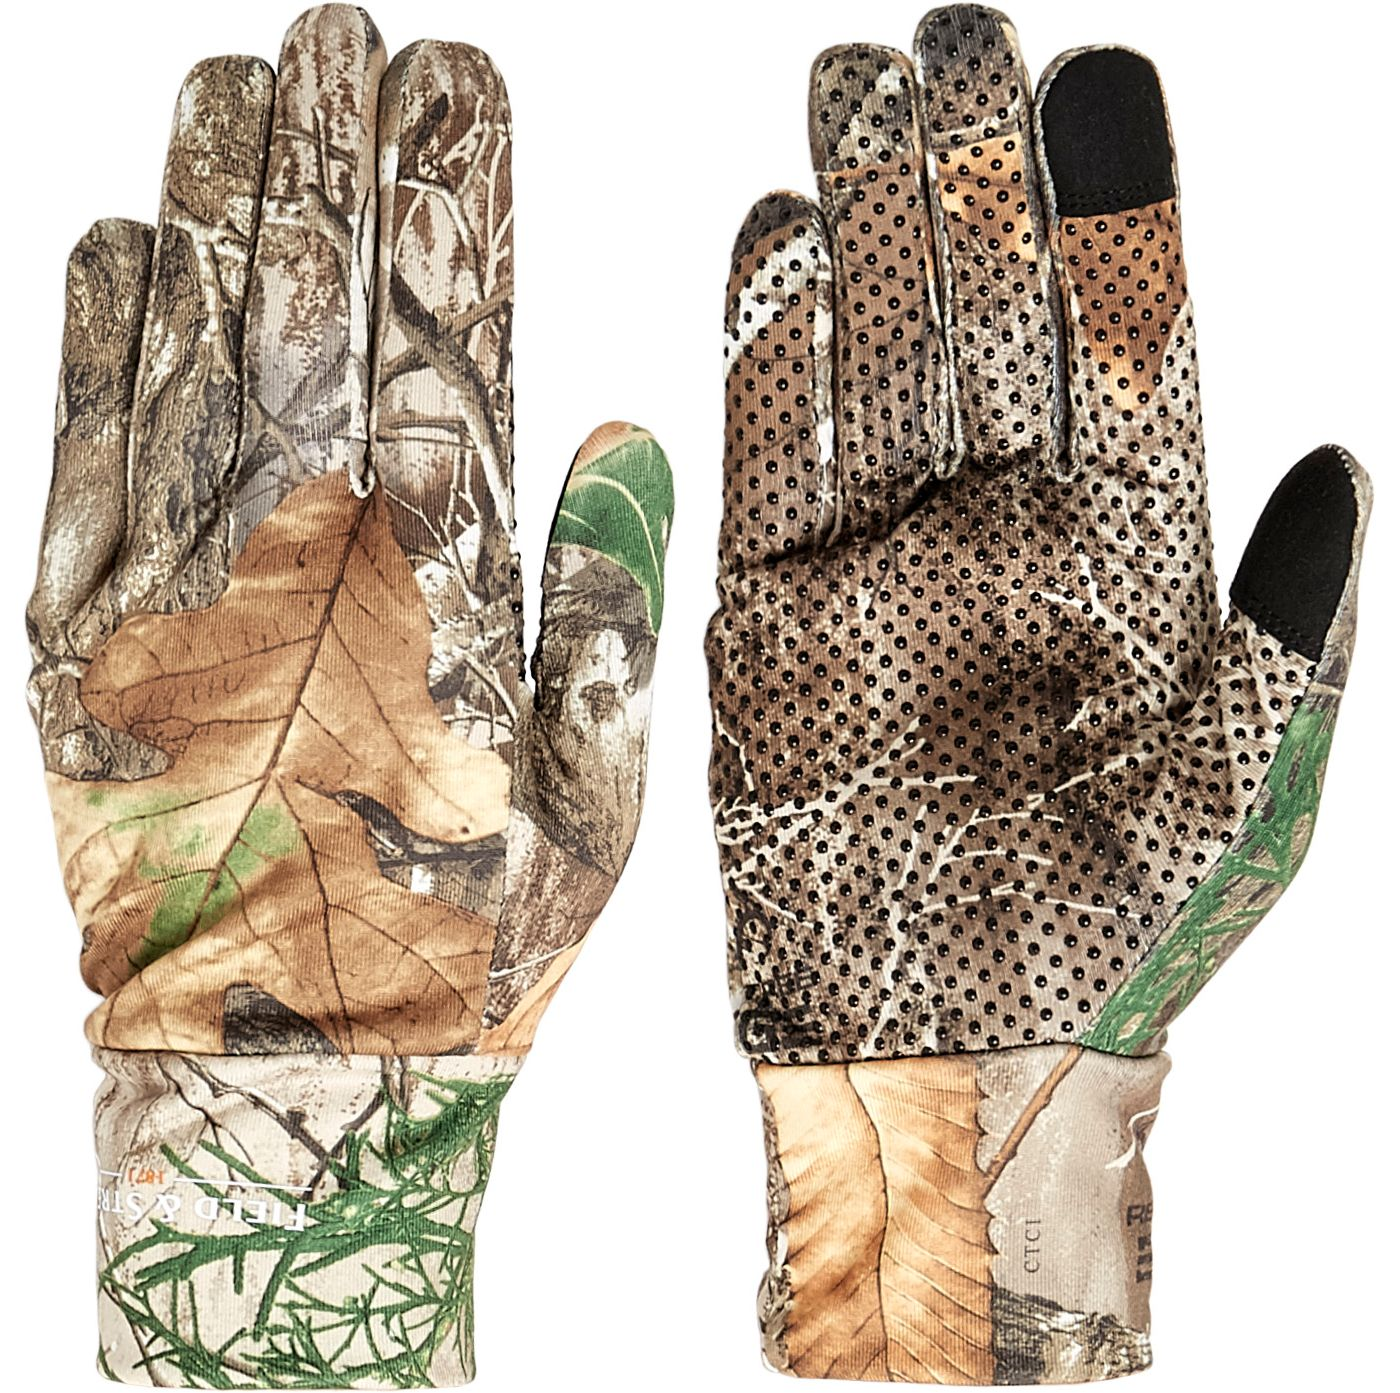 Field & Stream Women's Lightweight Core Hunting Gloves